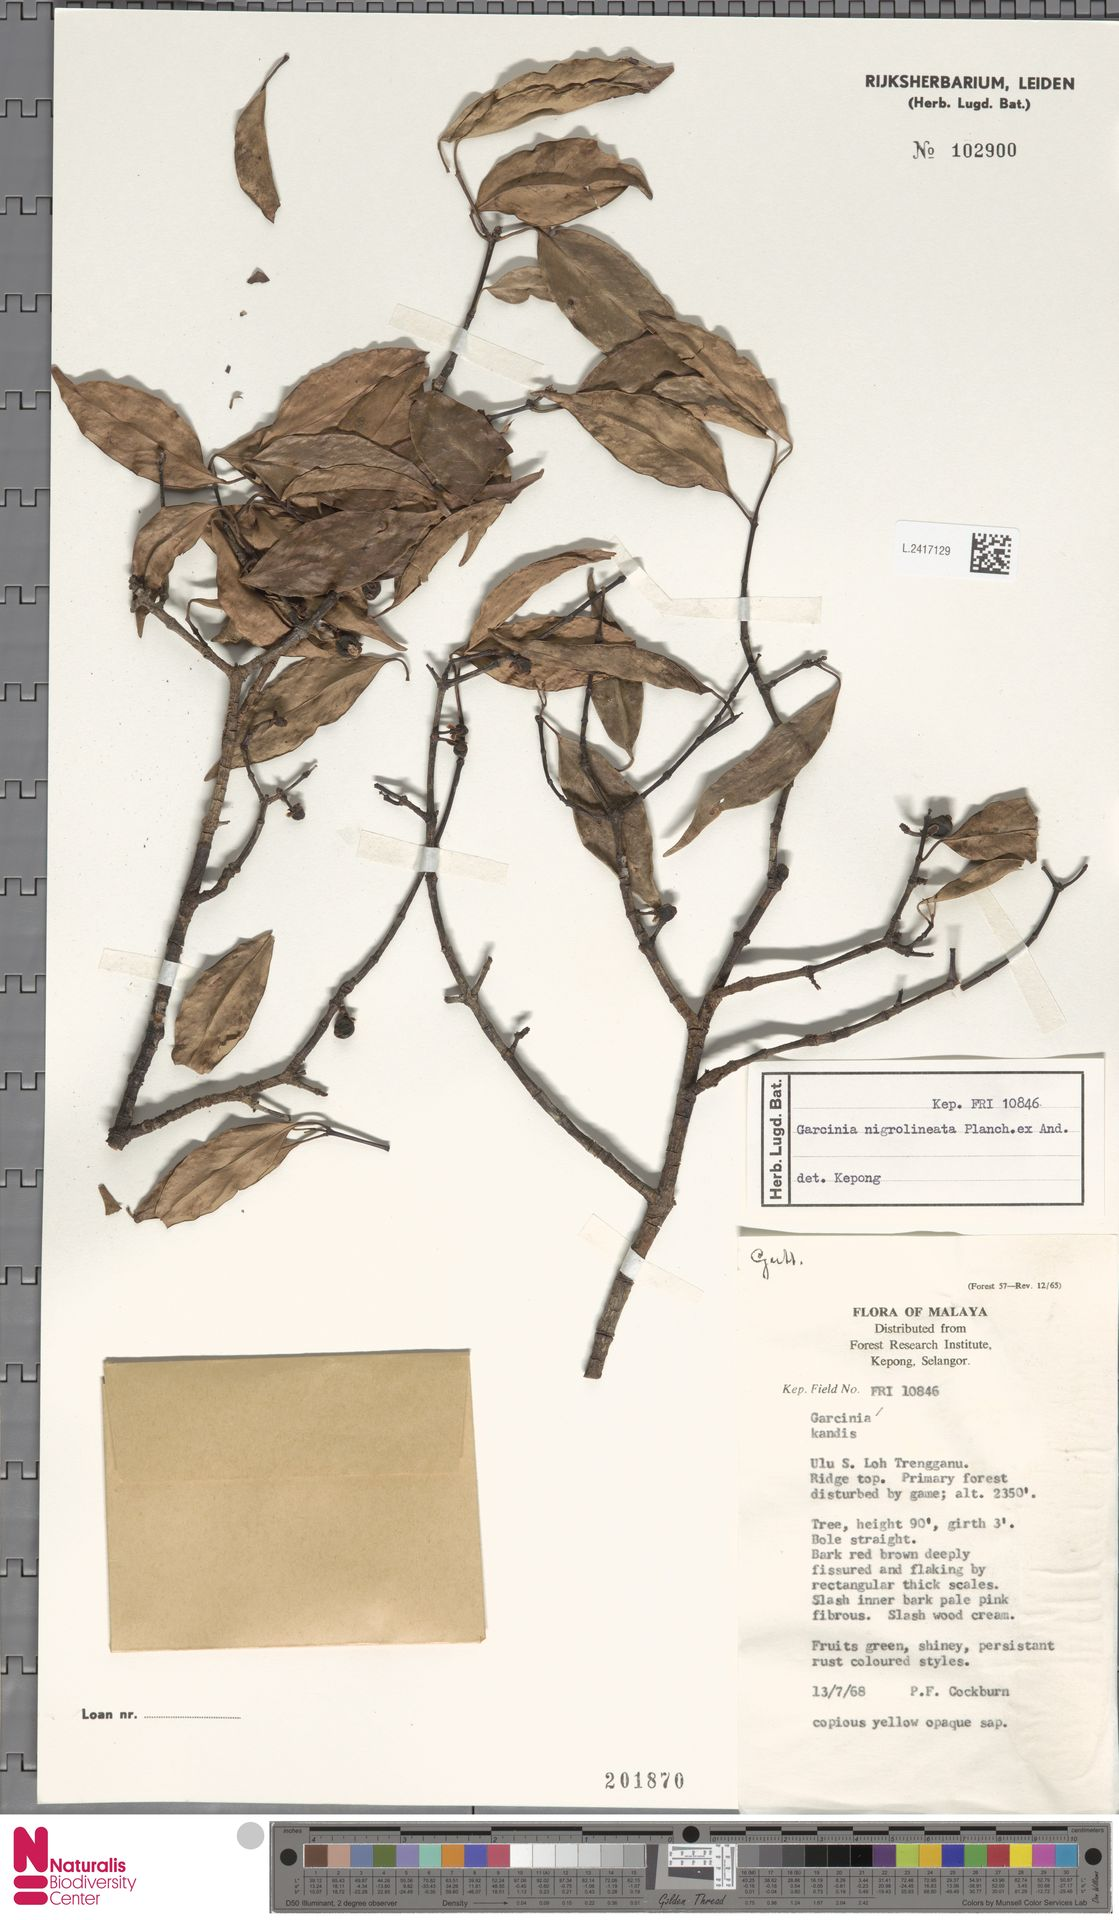 L.2417129 | Garcinia nigrolineata Planch. ex T.Anderson